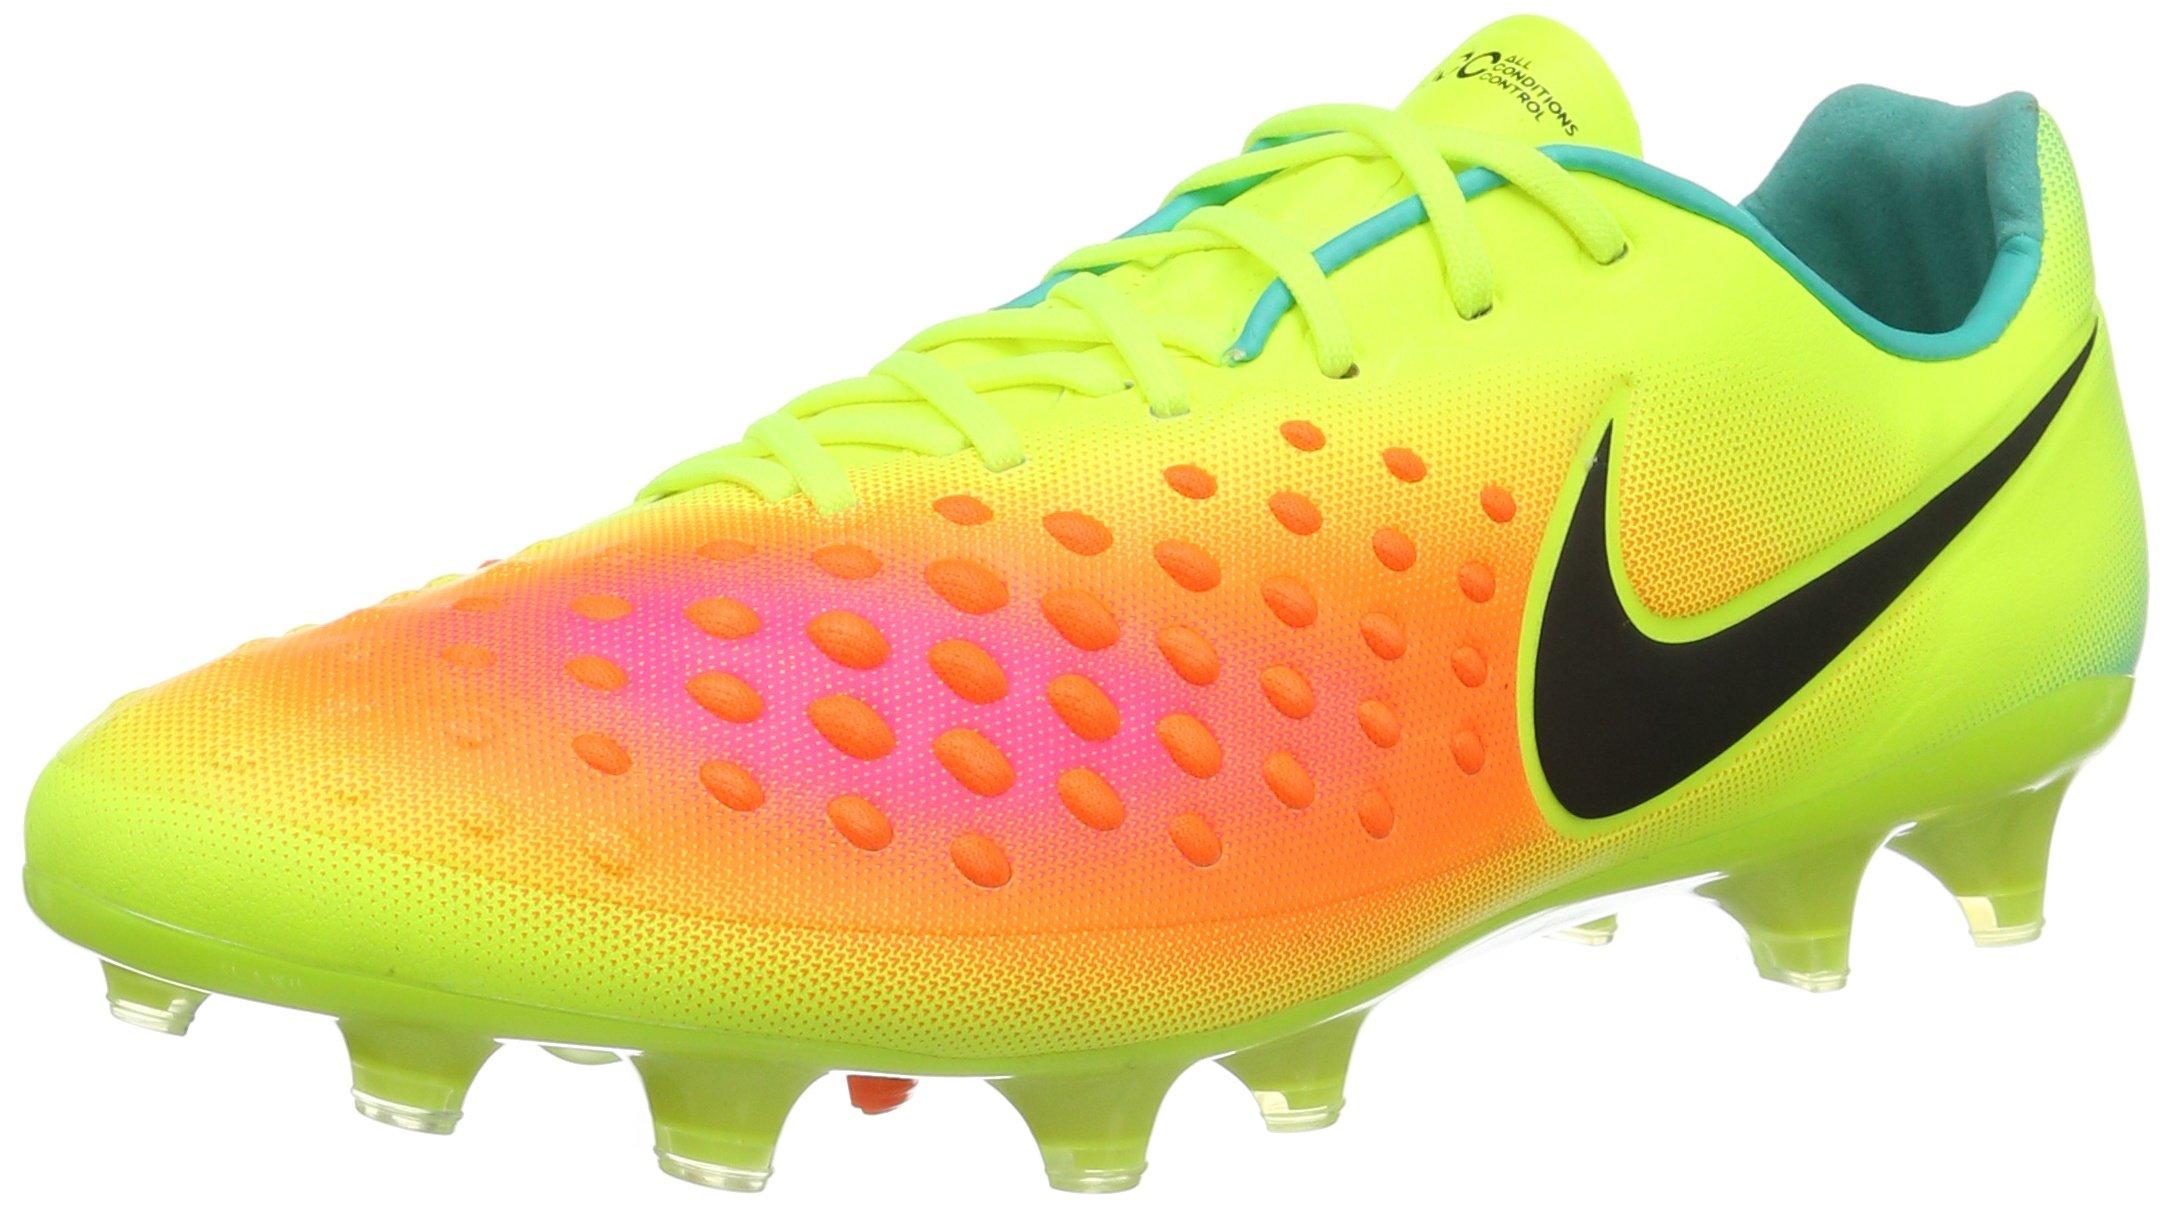 Blast42 Opus total HommeAmarillovoltBlack Ii Football De Eu Orange Nike pink FgChaussures Magista 5 XZwPuTiOkl